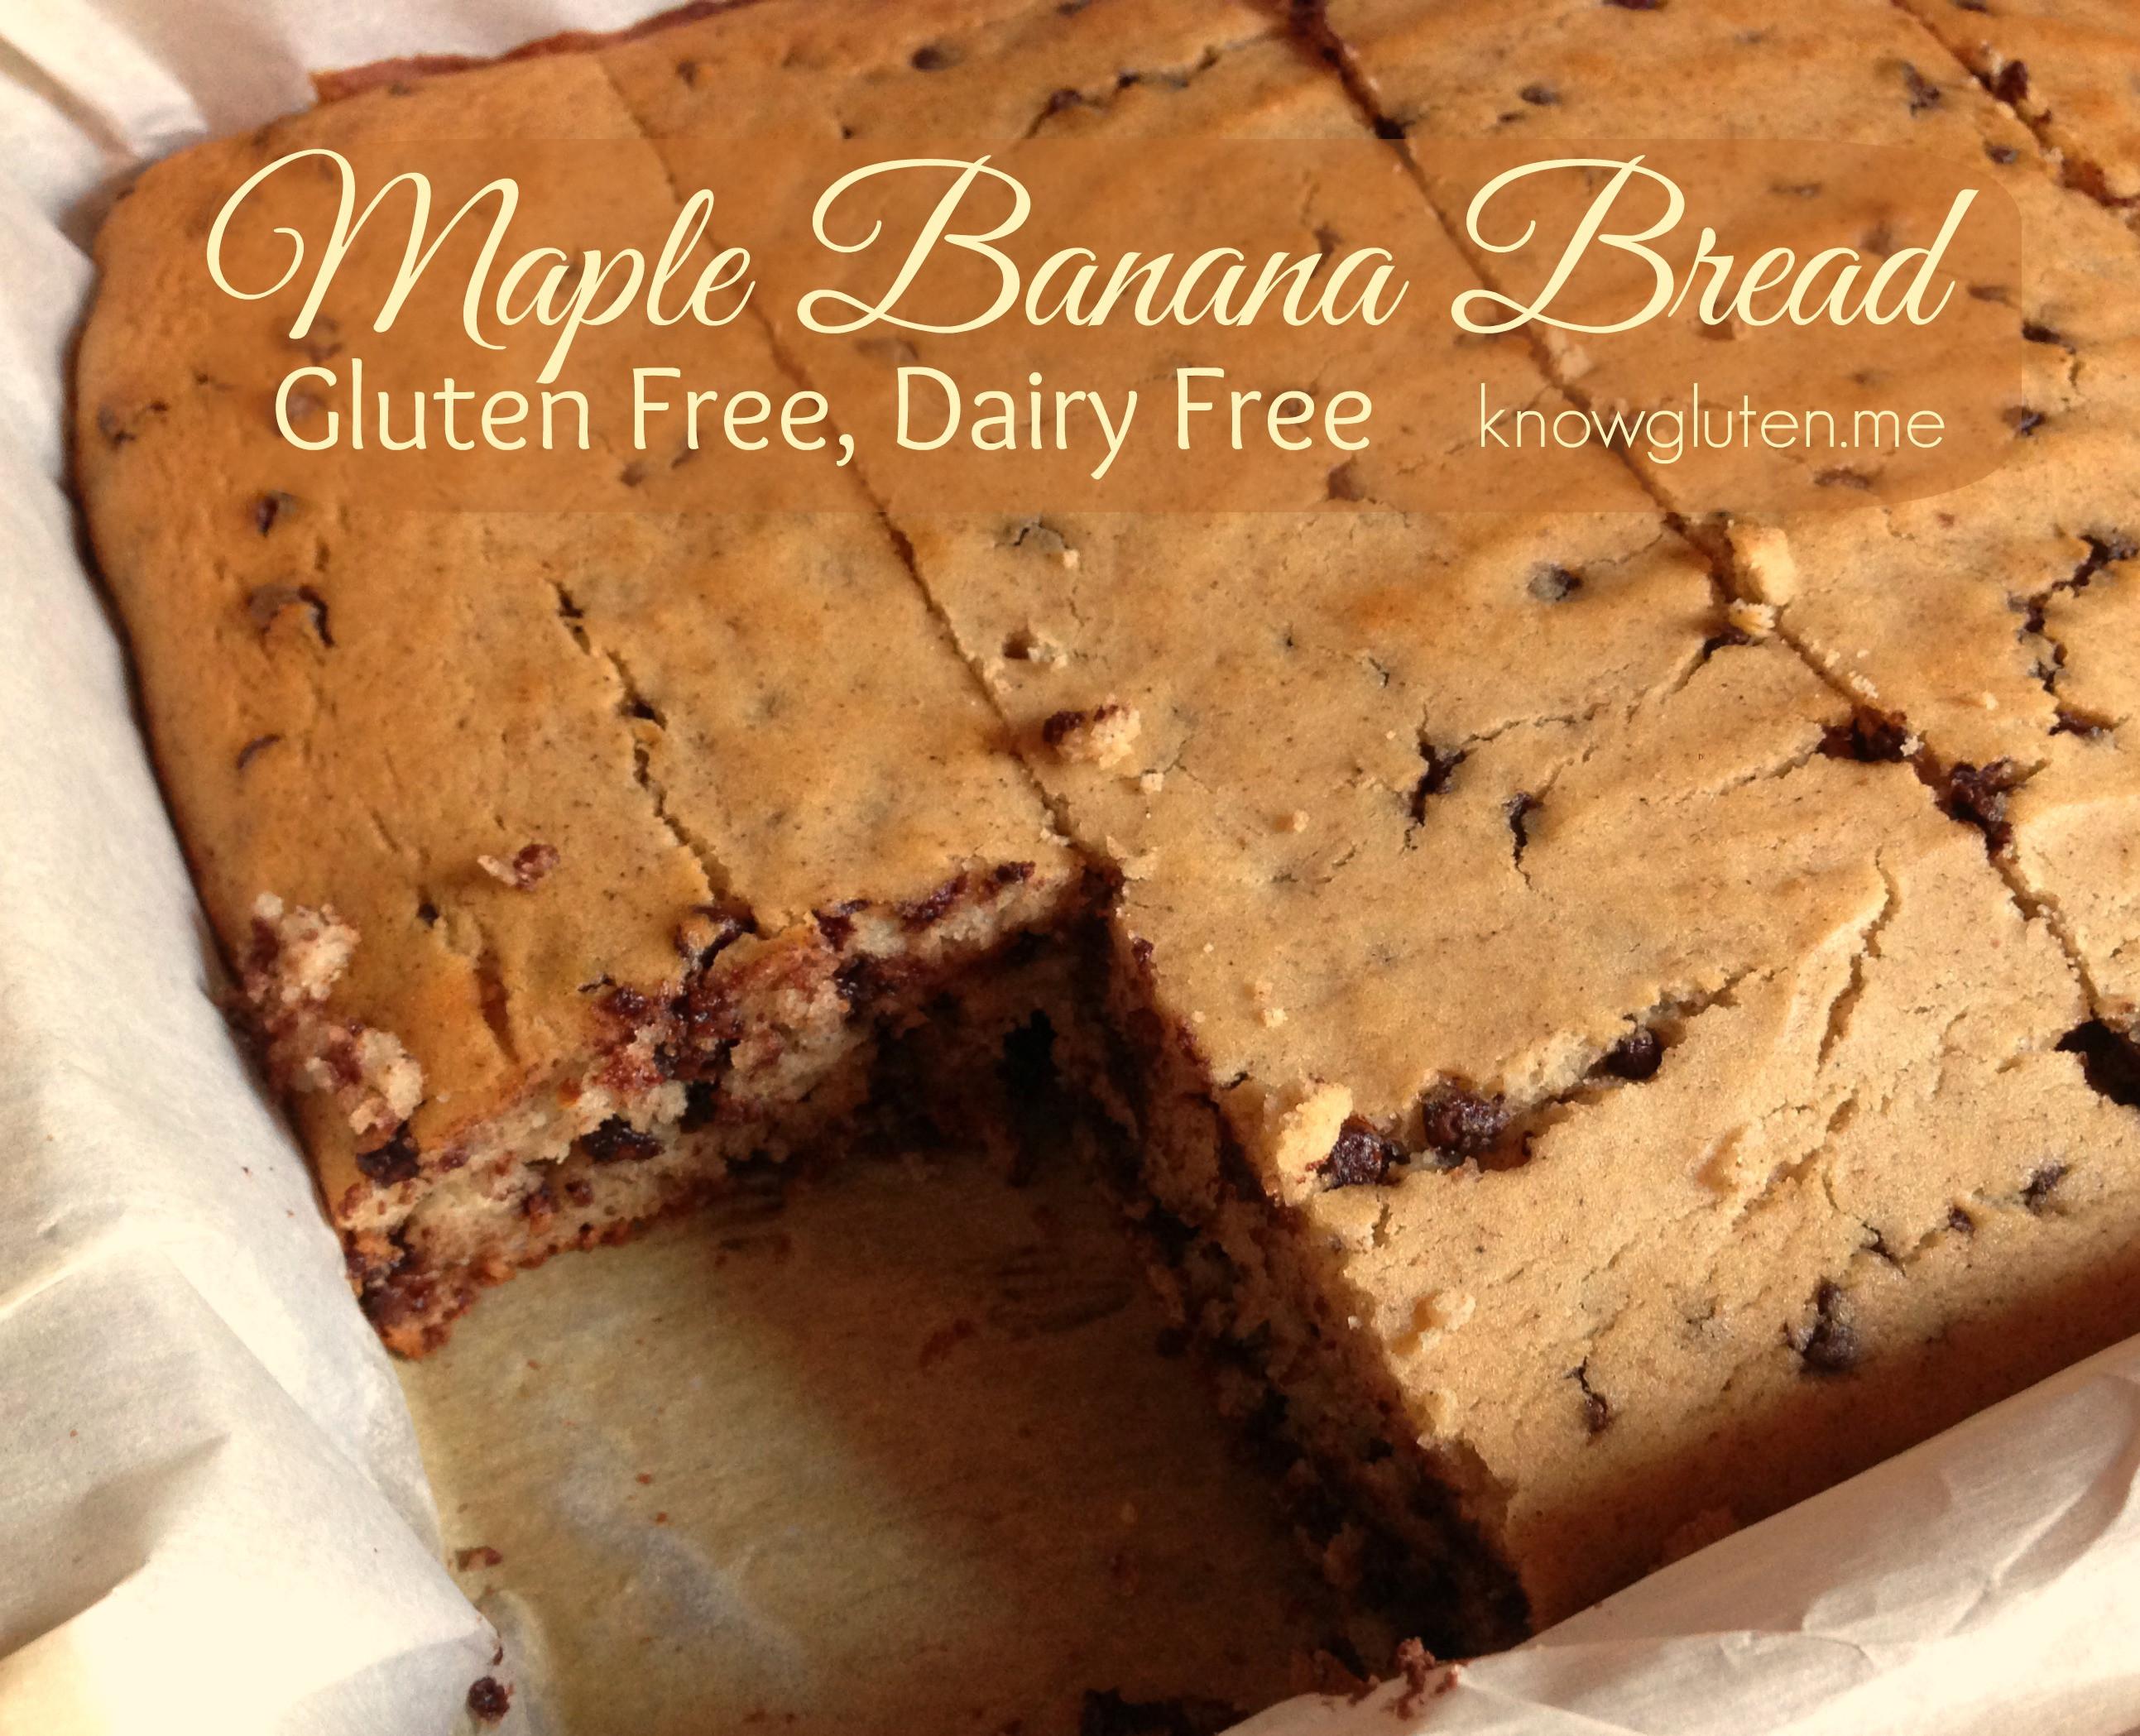 Gluten Free Dairy Free Banana Bread  Gluten Free Dairy Free Maple Banana Bread know gluten